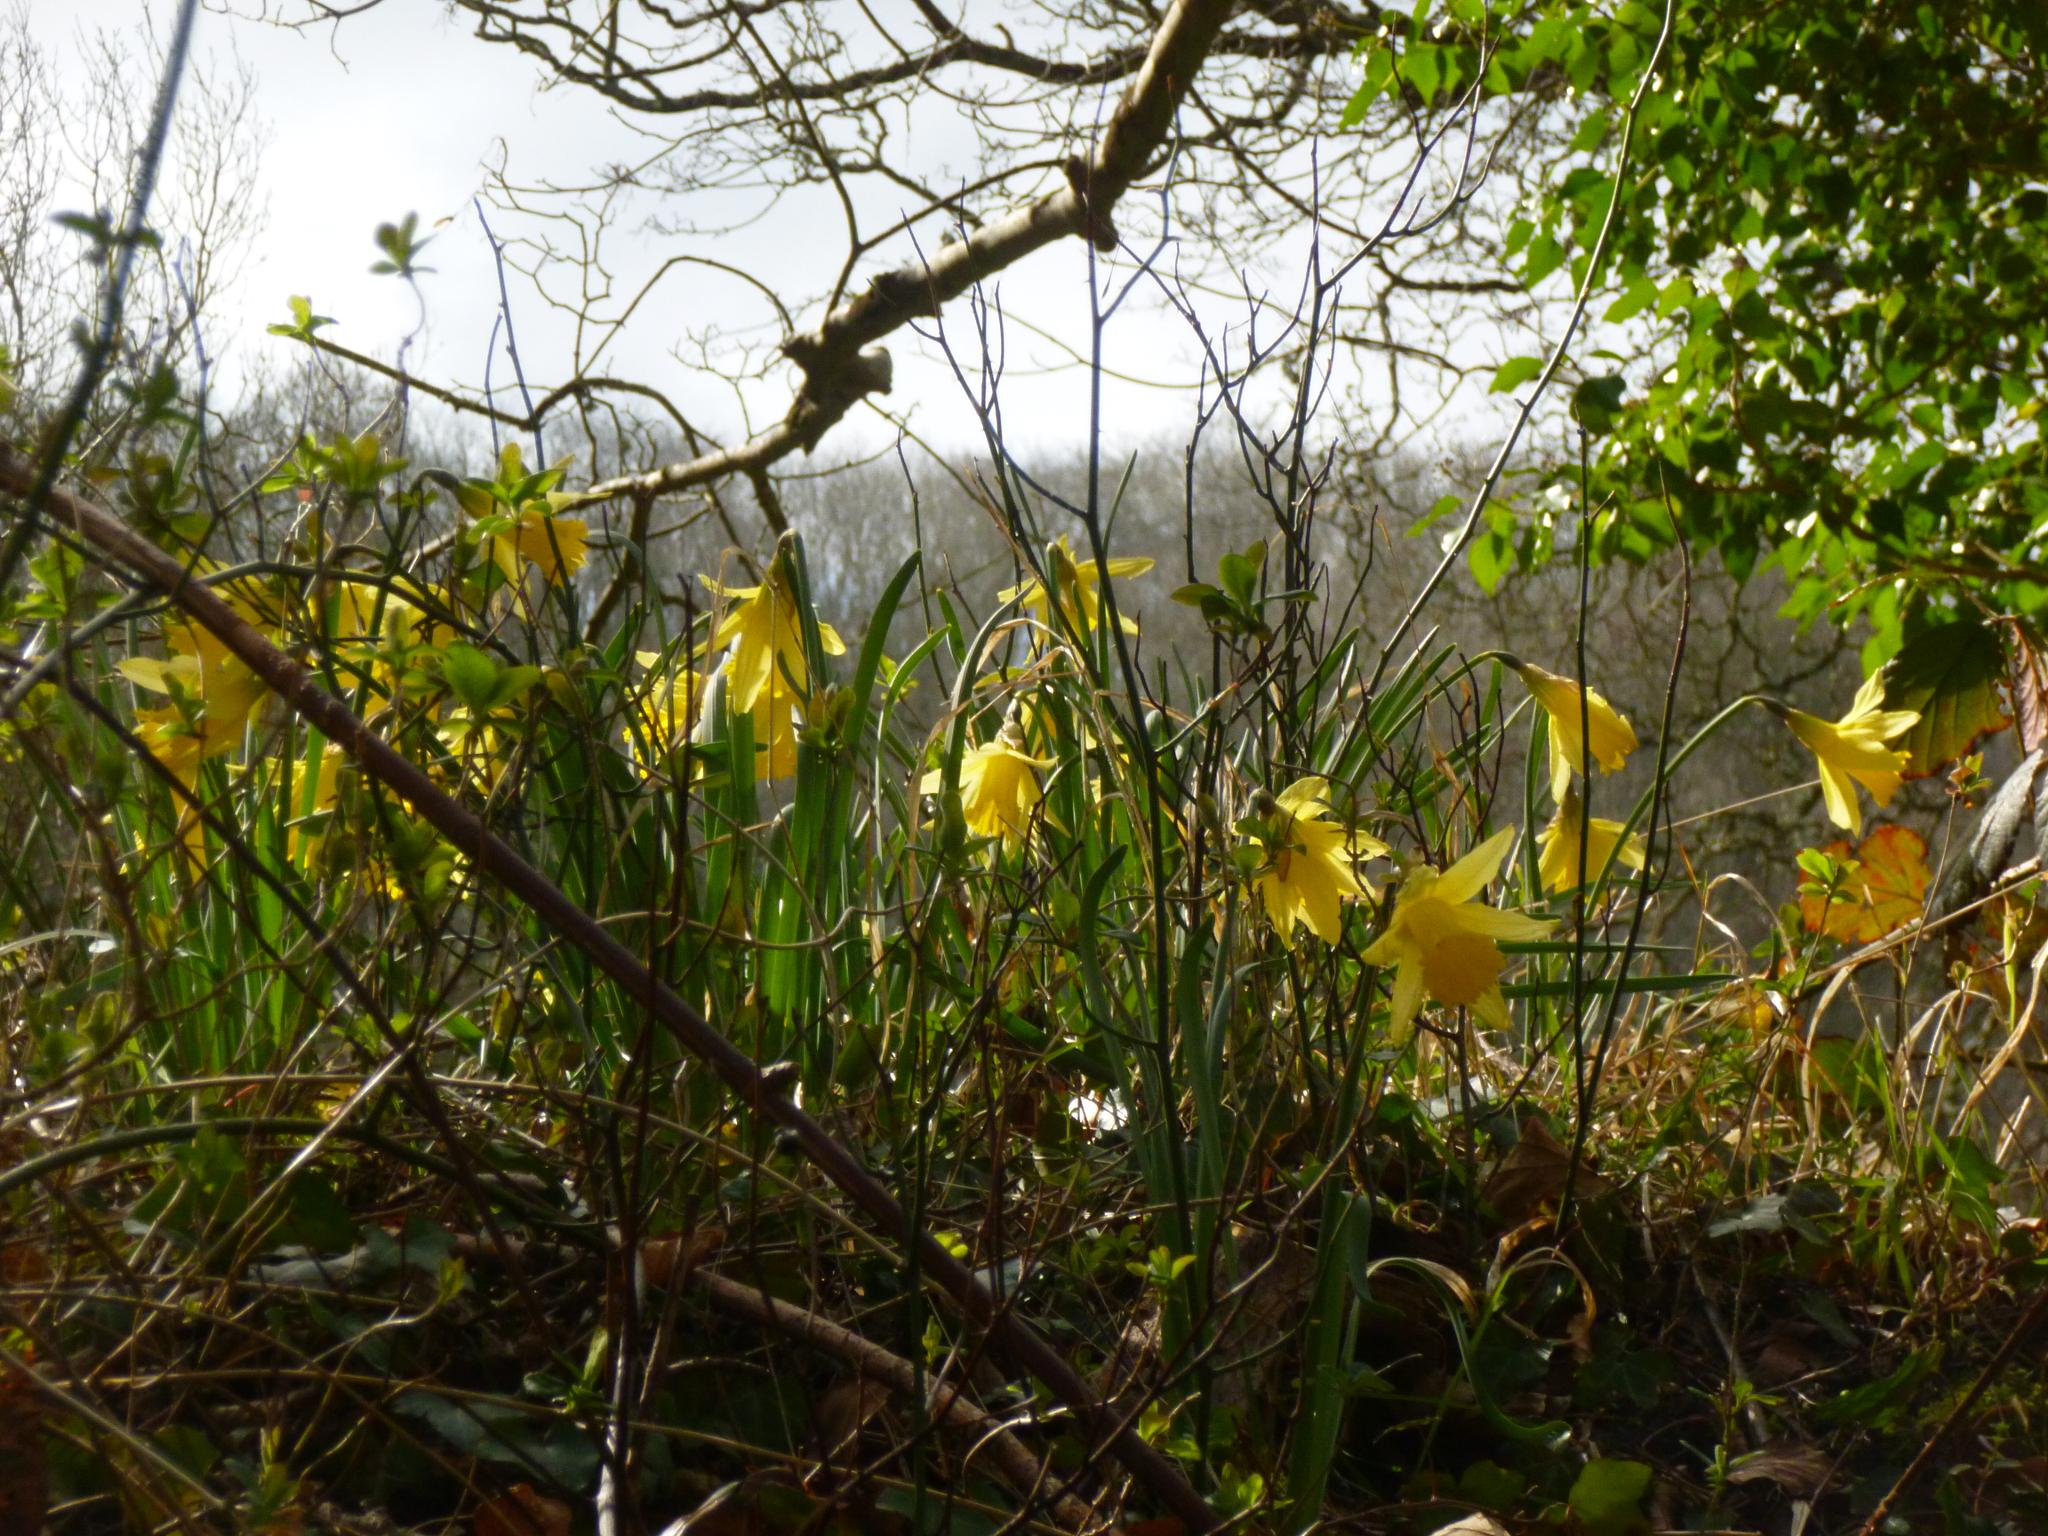 woodland flowers by chris.adams.3557